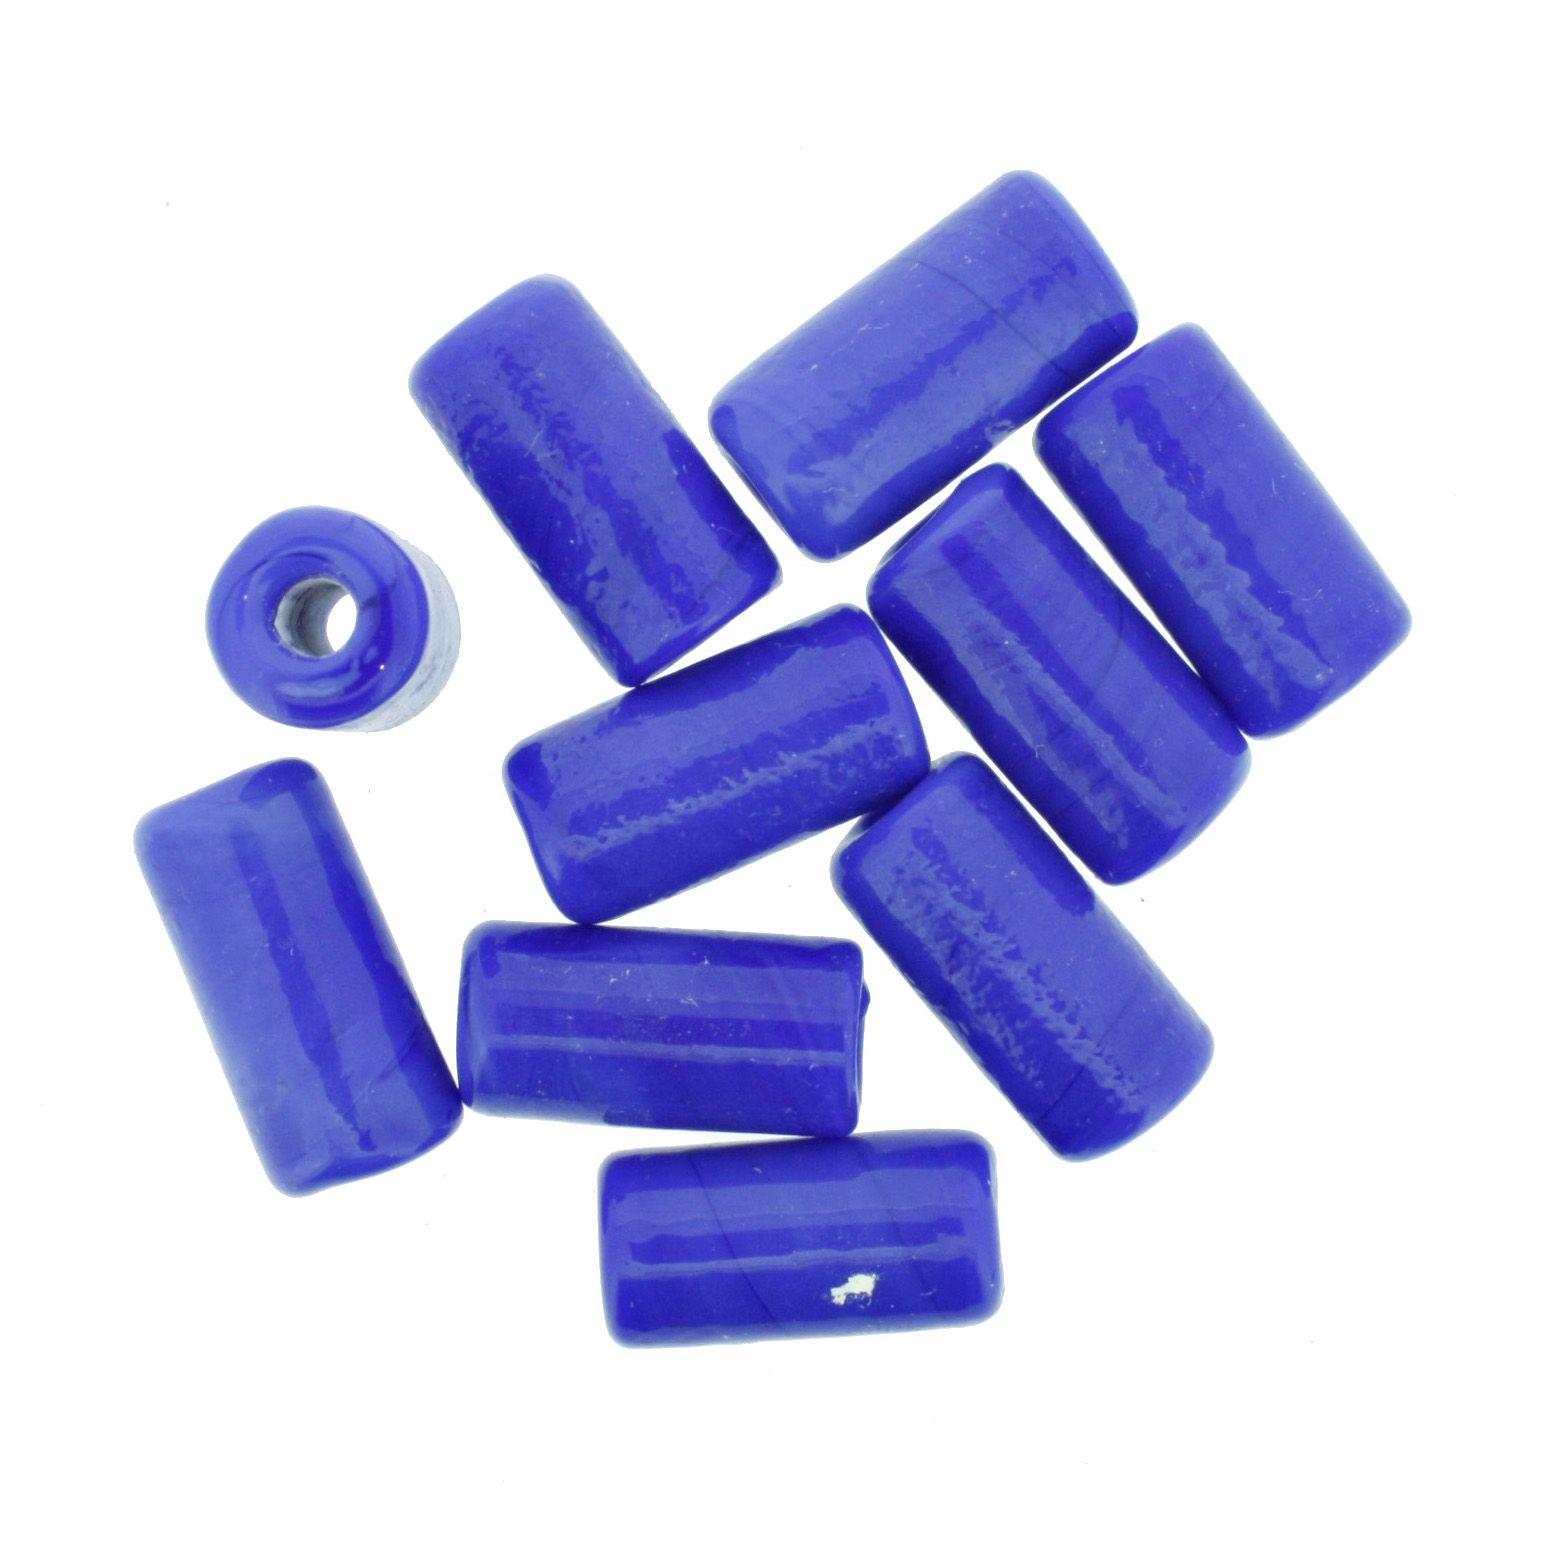 Firma Lisa - Azul  - Stéphanie Bijoux® - Peças para Bijuterias e Artesanato